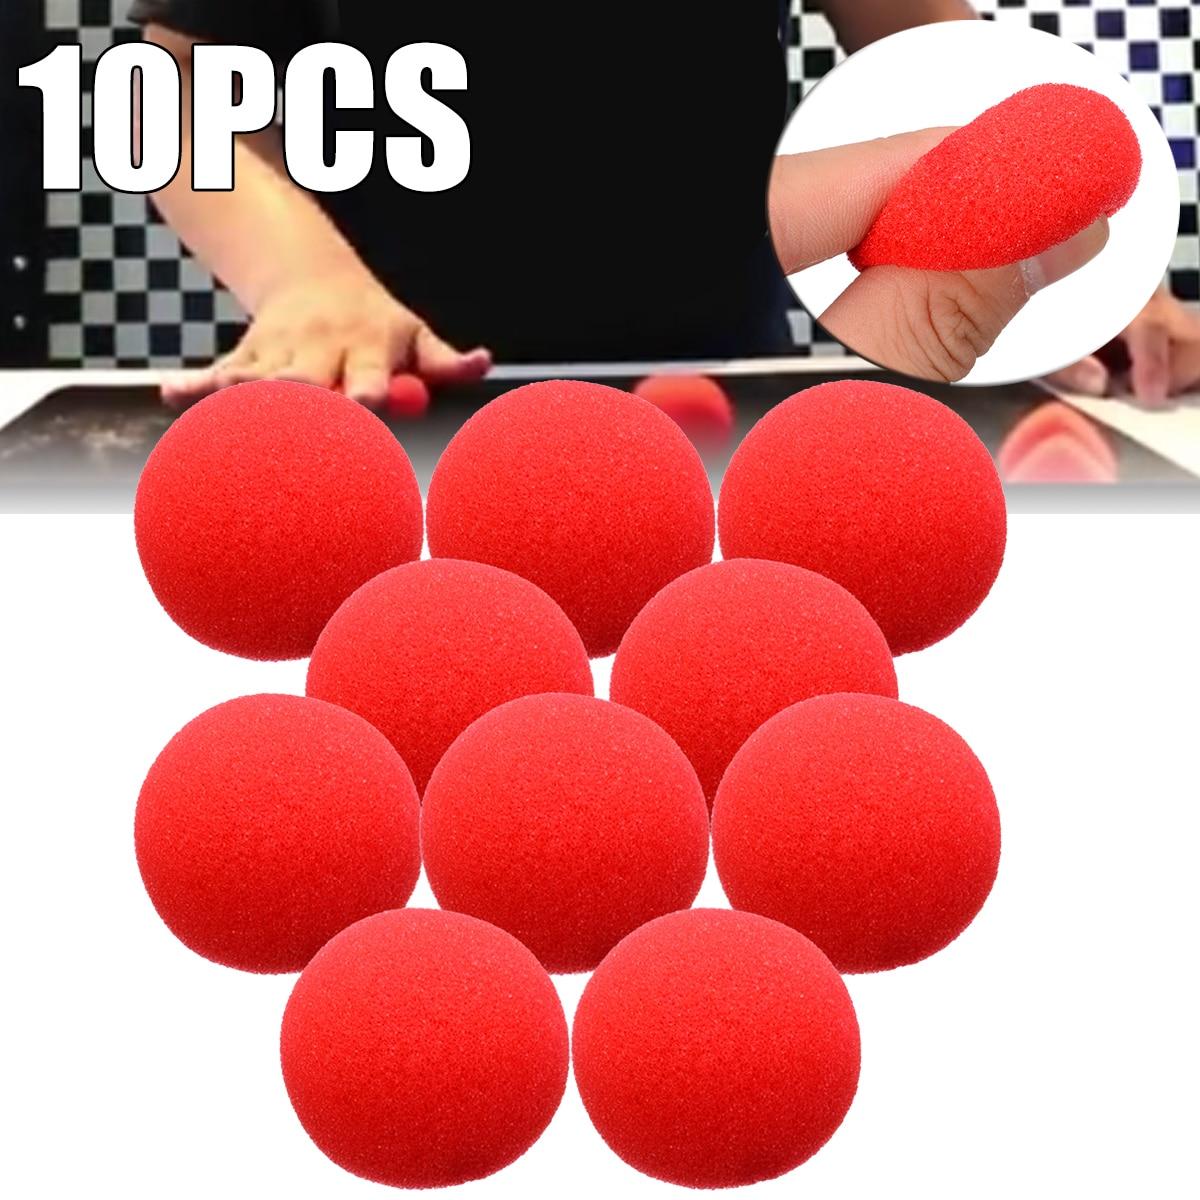 10pcs 4.5cm Adorable Red Ball Super Soft Sponge Balls For Magic Party Stage Trick Prop Clown Nose